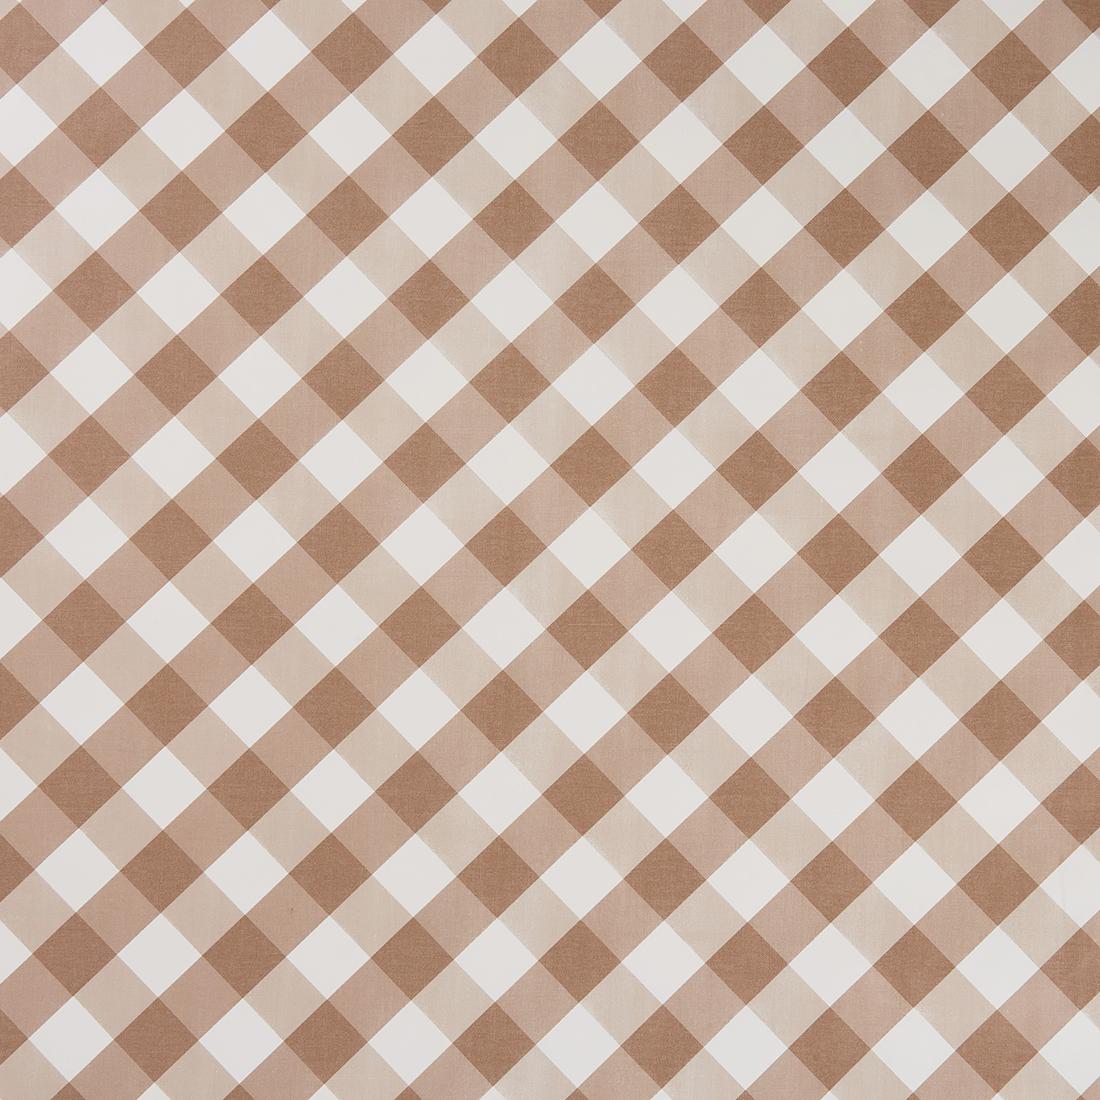 Parma Linen Oil cloth